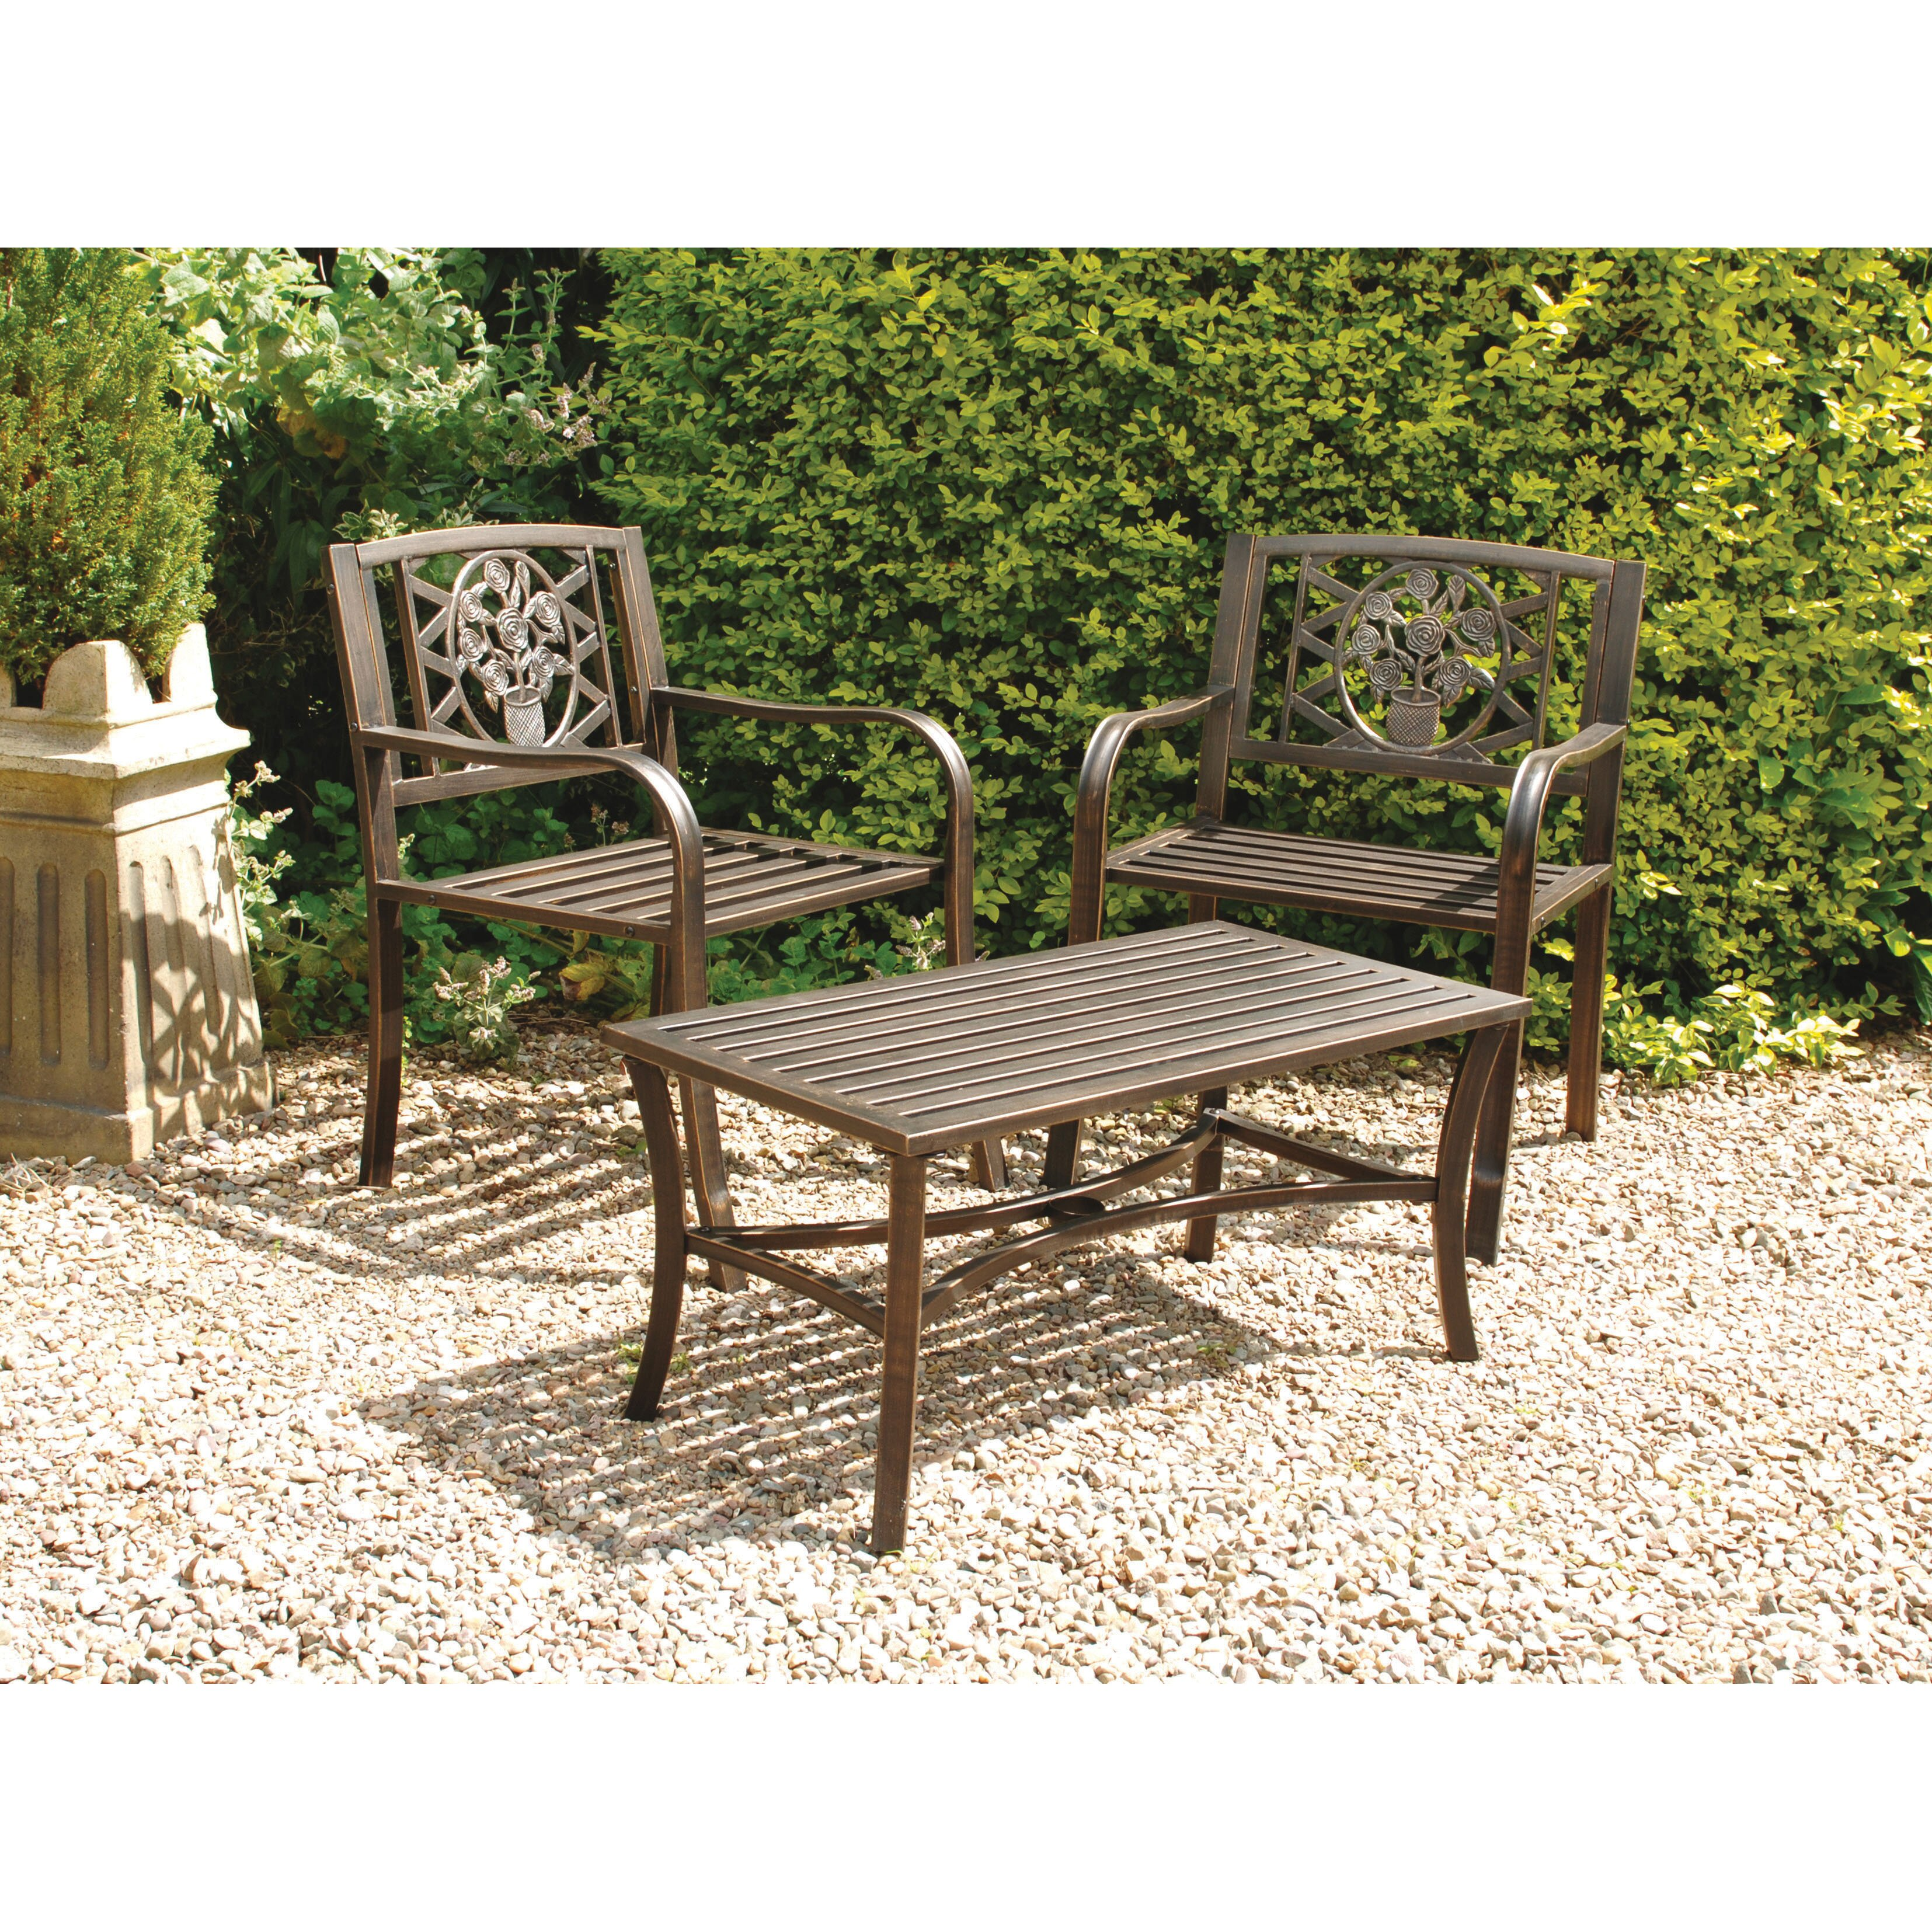 gablemere coalbrookdale coffee table reviews wayfair uk. Black Bedroom Furniture Sets. Home Design Ideas